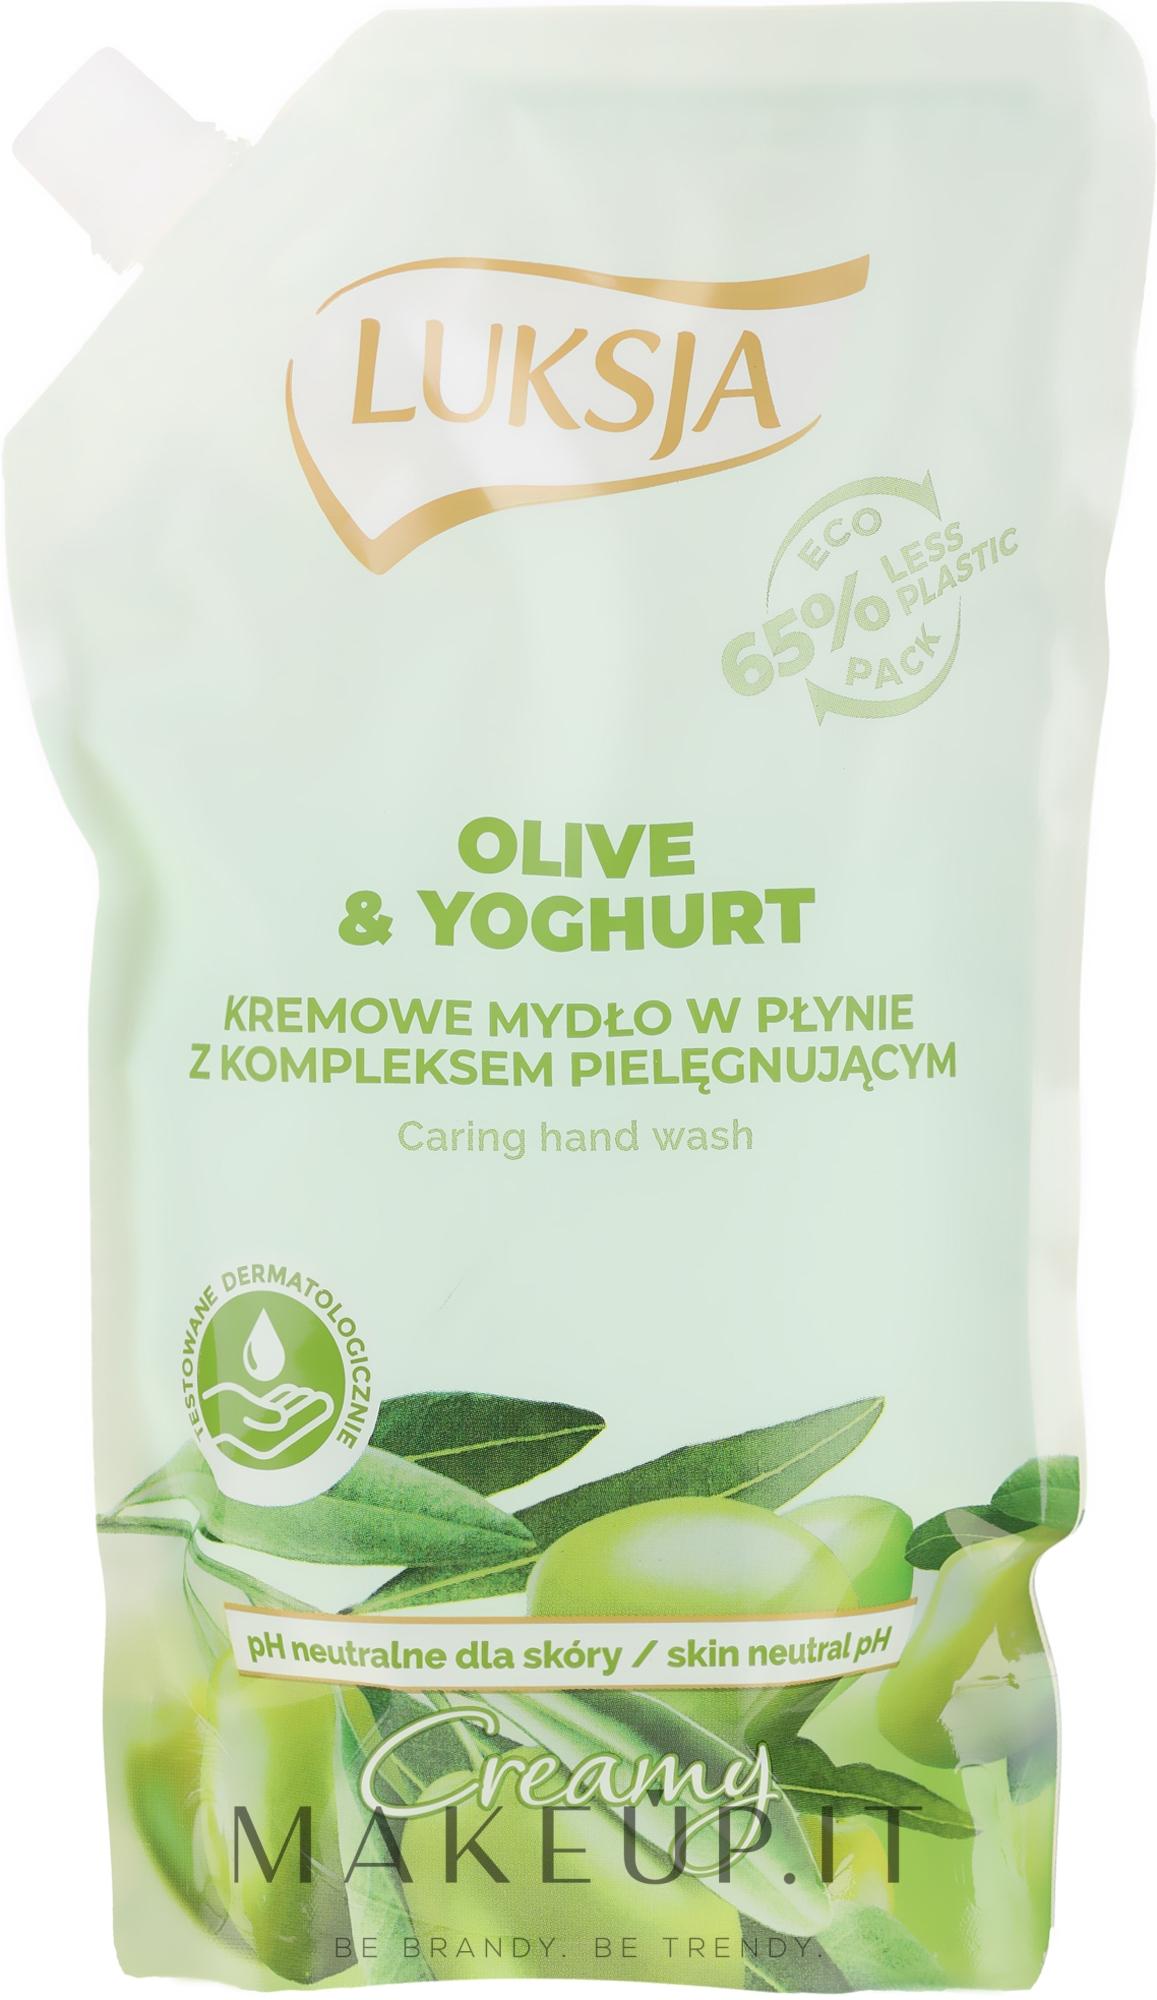 "Sapone liquido ""Olio d'oliva e yogurt"" - Luksja Creamy Olive & Yogurt Soap (doypack) — foto 400 ml"